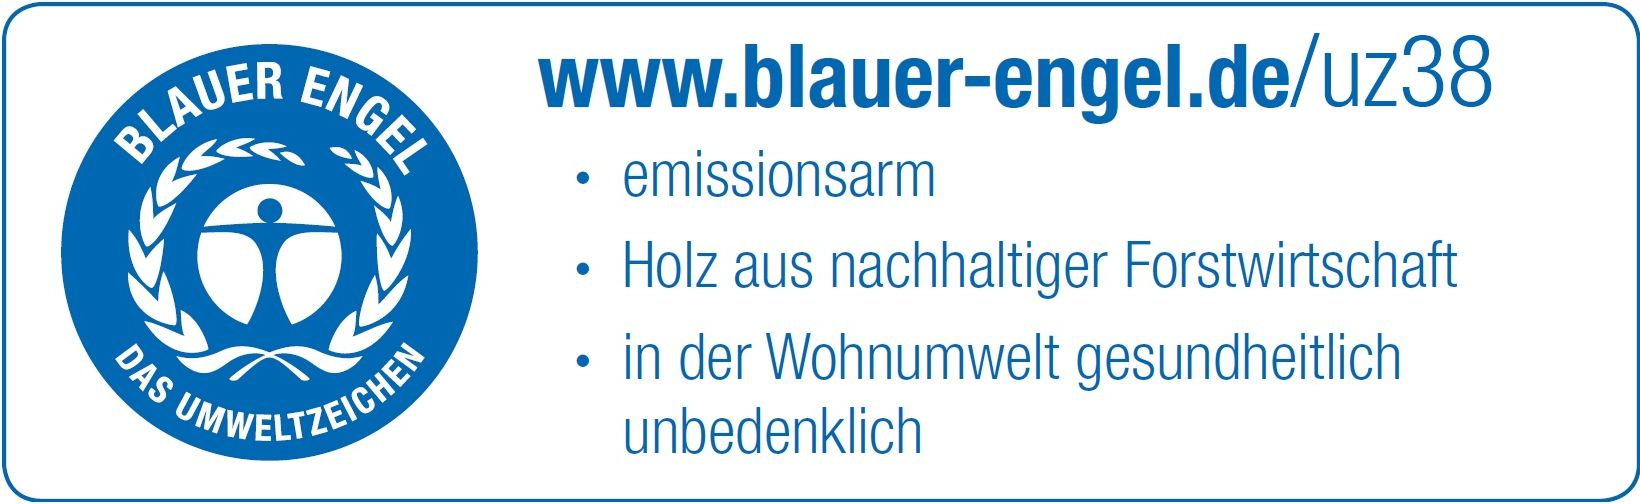 Zertifikat Blauer Engel